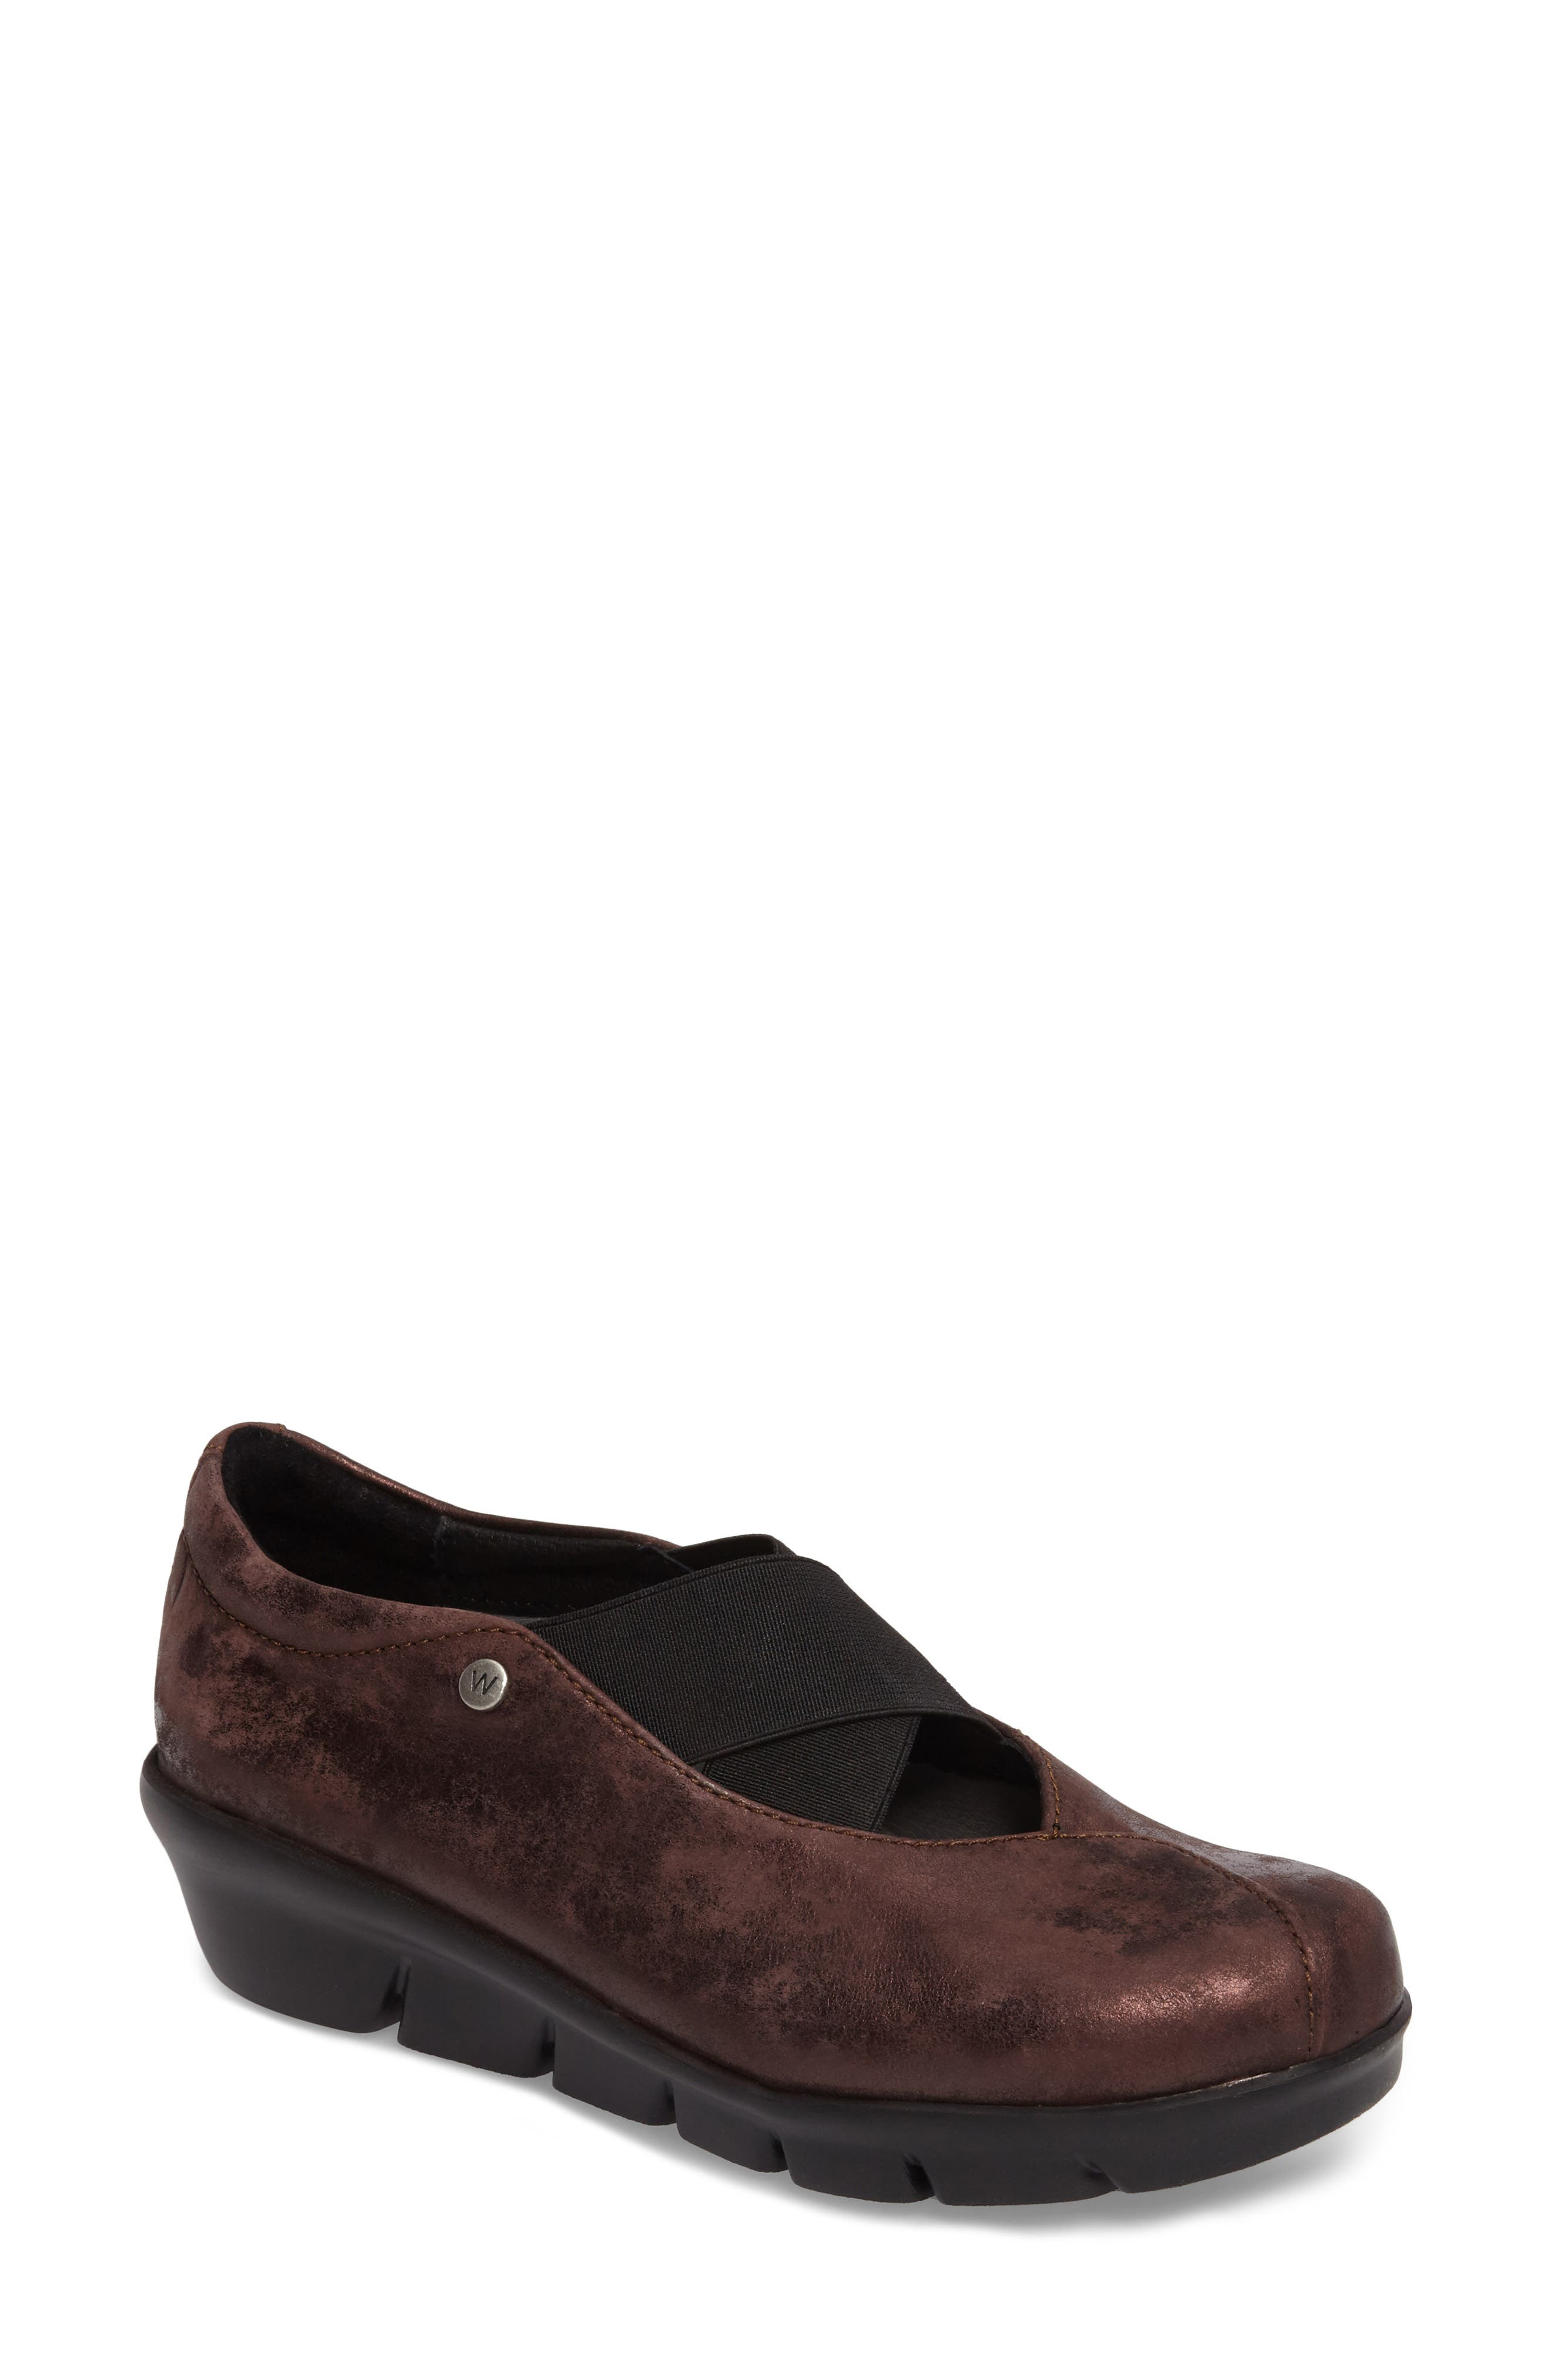 Cursa Slip-On Sneaker,                         Main,                         color, Mocha Leather